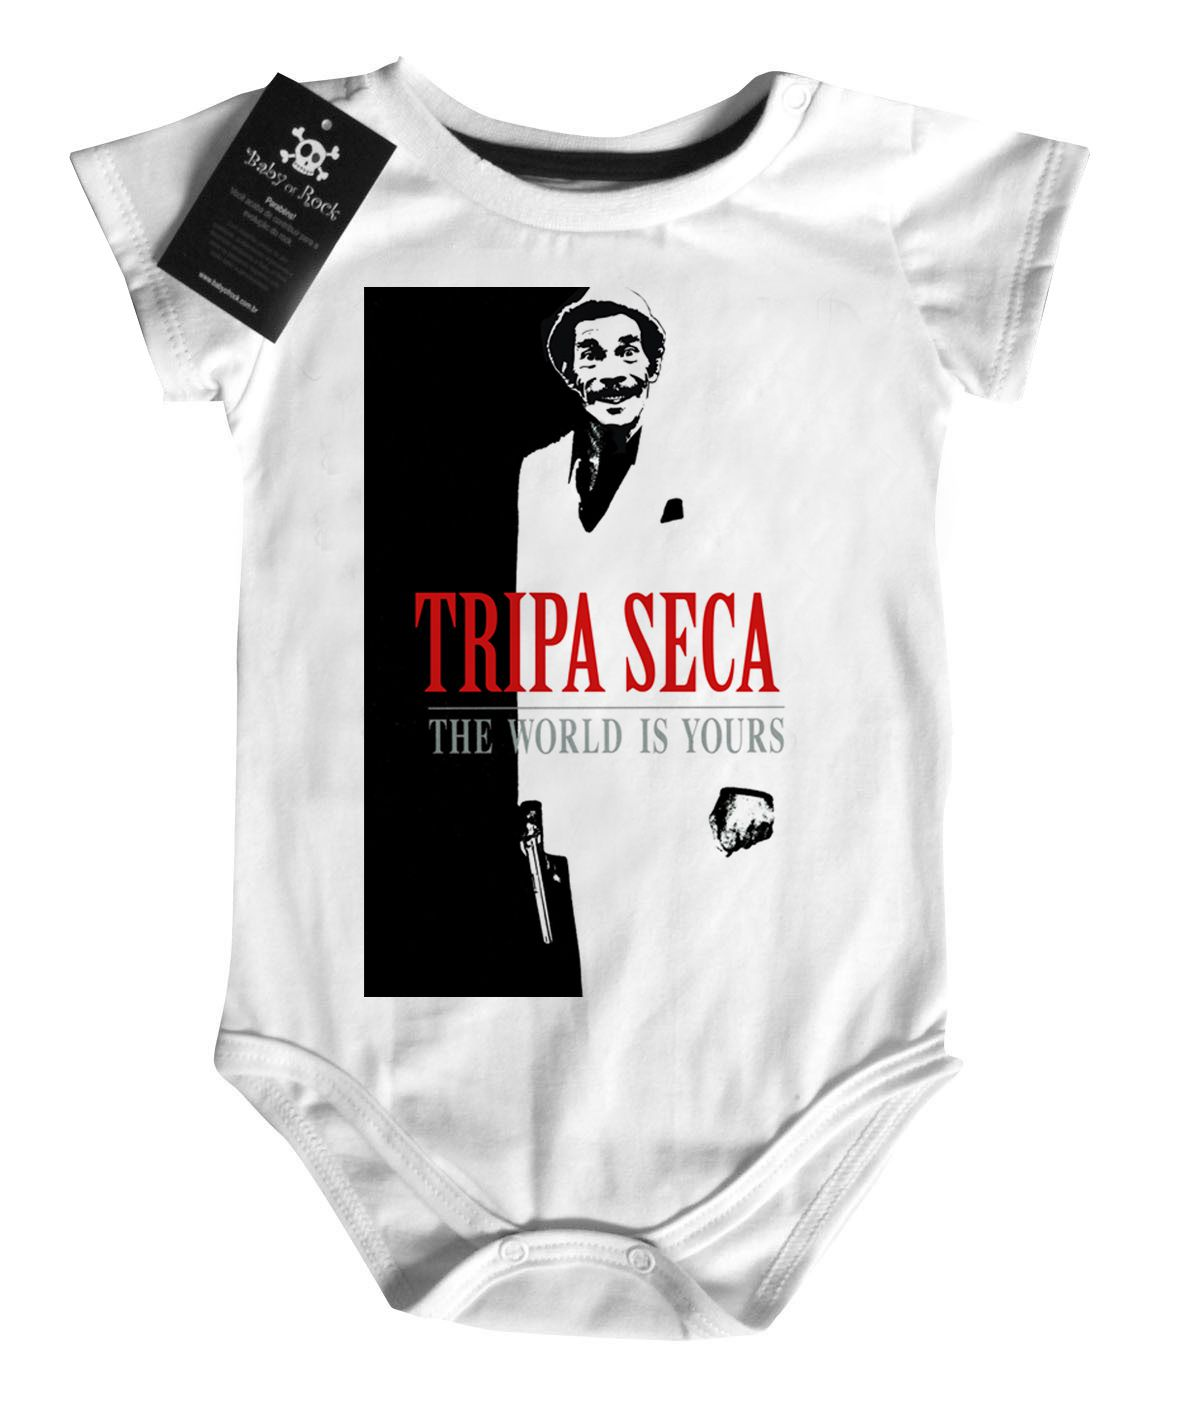 Body Bebê Tripa Seca - White - Seu Madruga  - Baby Monster S/A